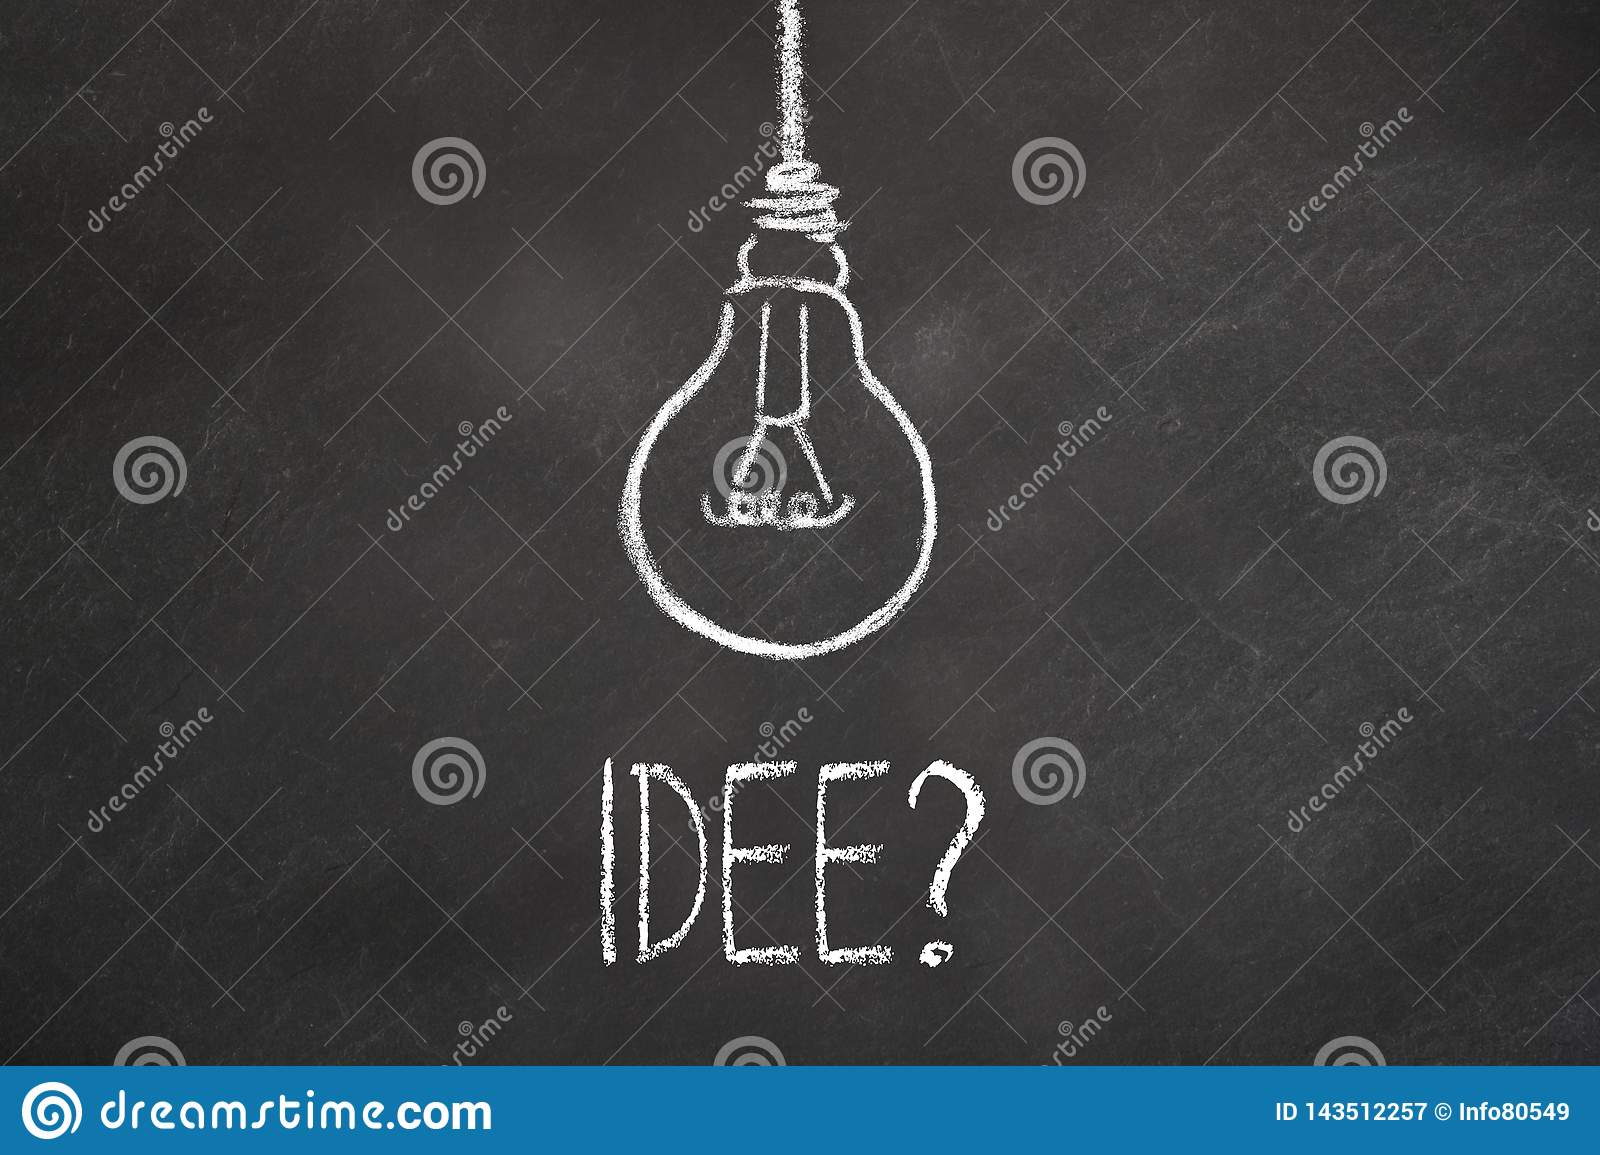 white chalk text idee hanging lightbulb chalkboard translation idea chalk text idee lightbulb chalkboard translation